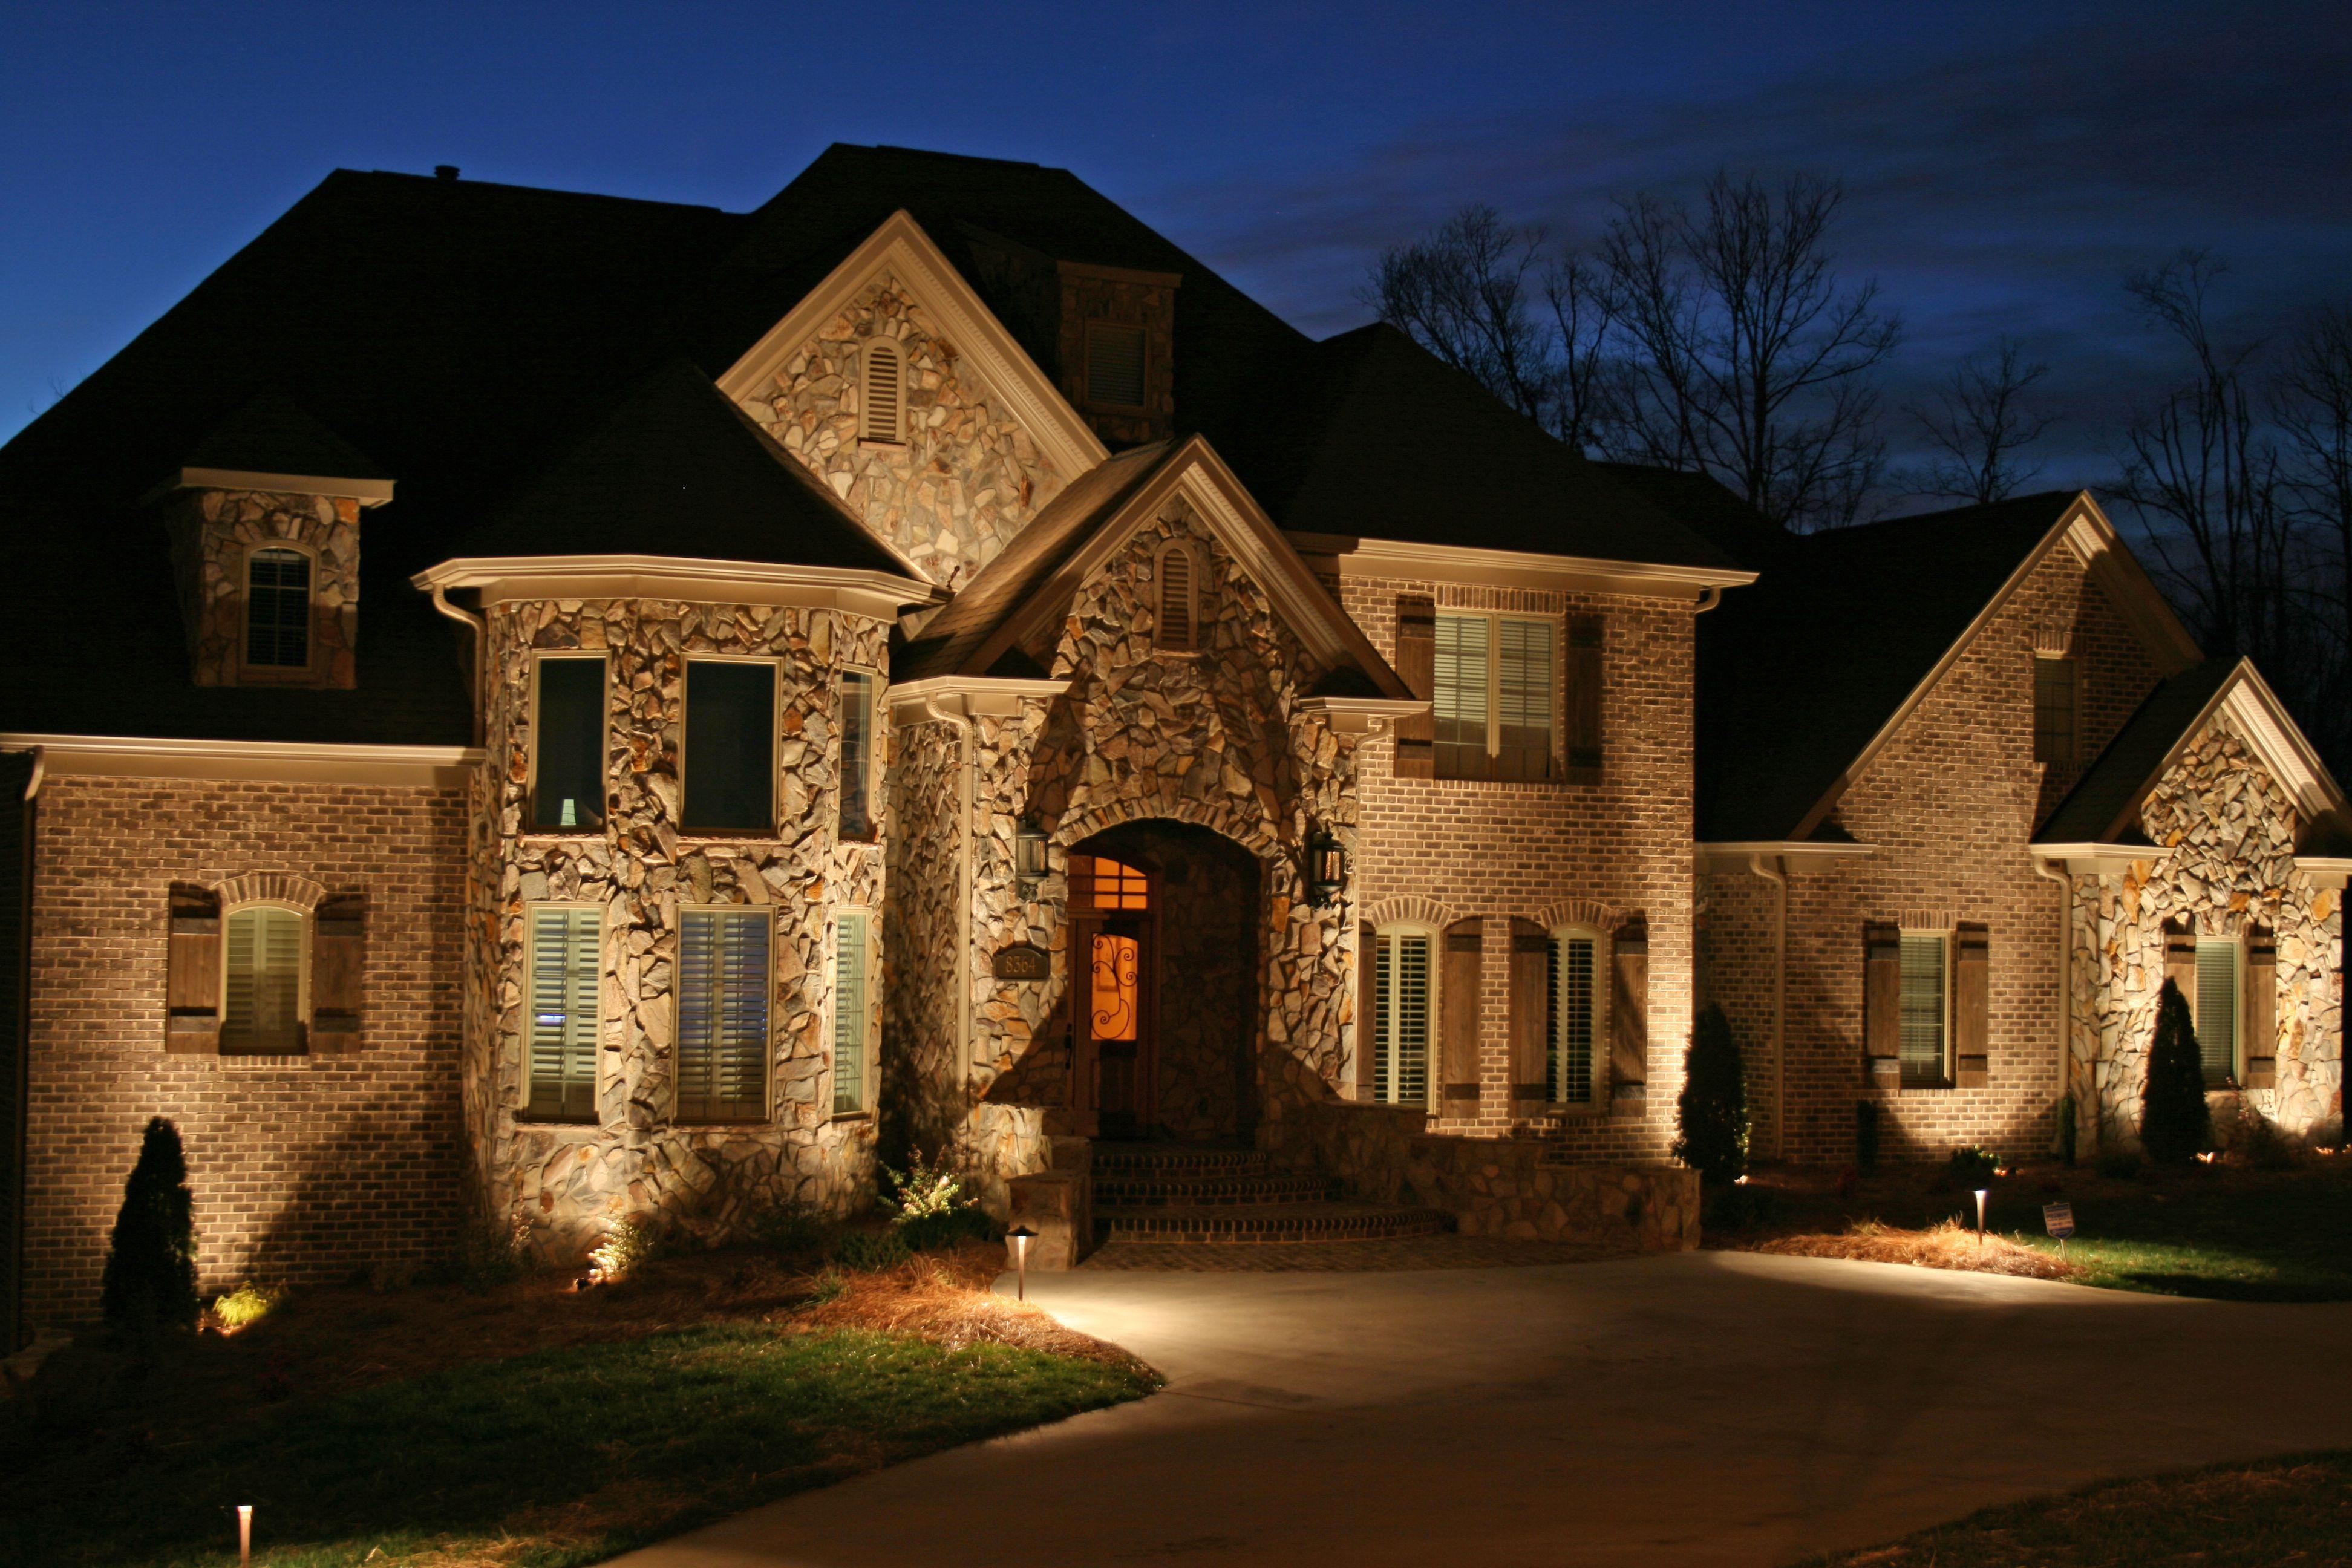 Outdoor Lighting Company In Columbia Sc Outdoor Lighting Design Exterior Lighting Landscape Lighting Design